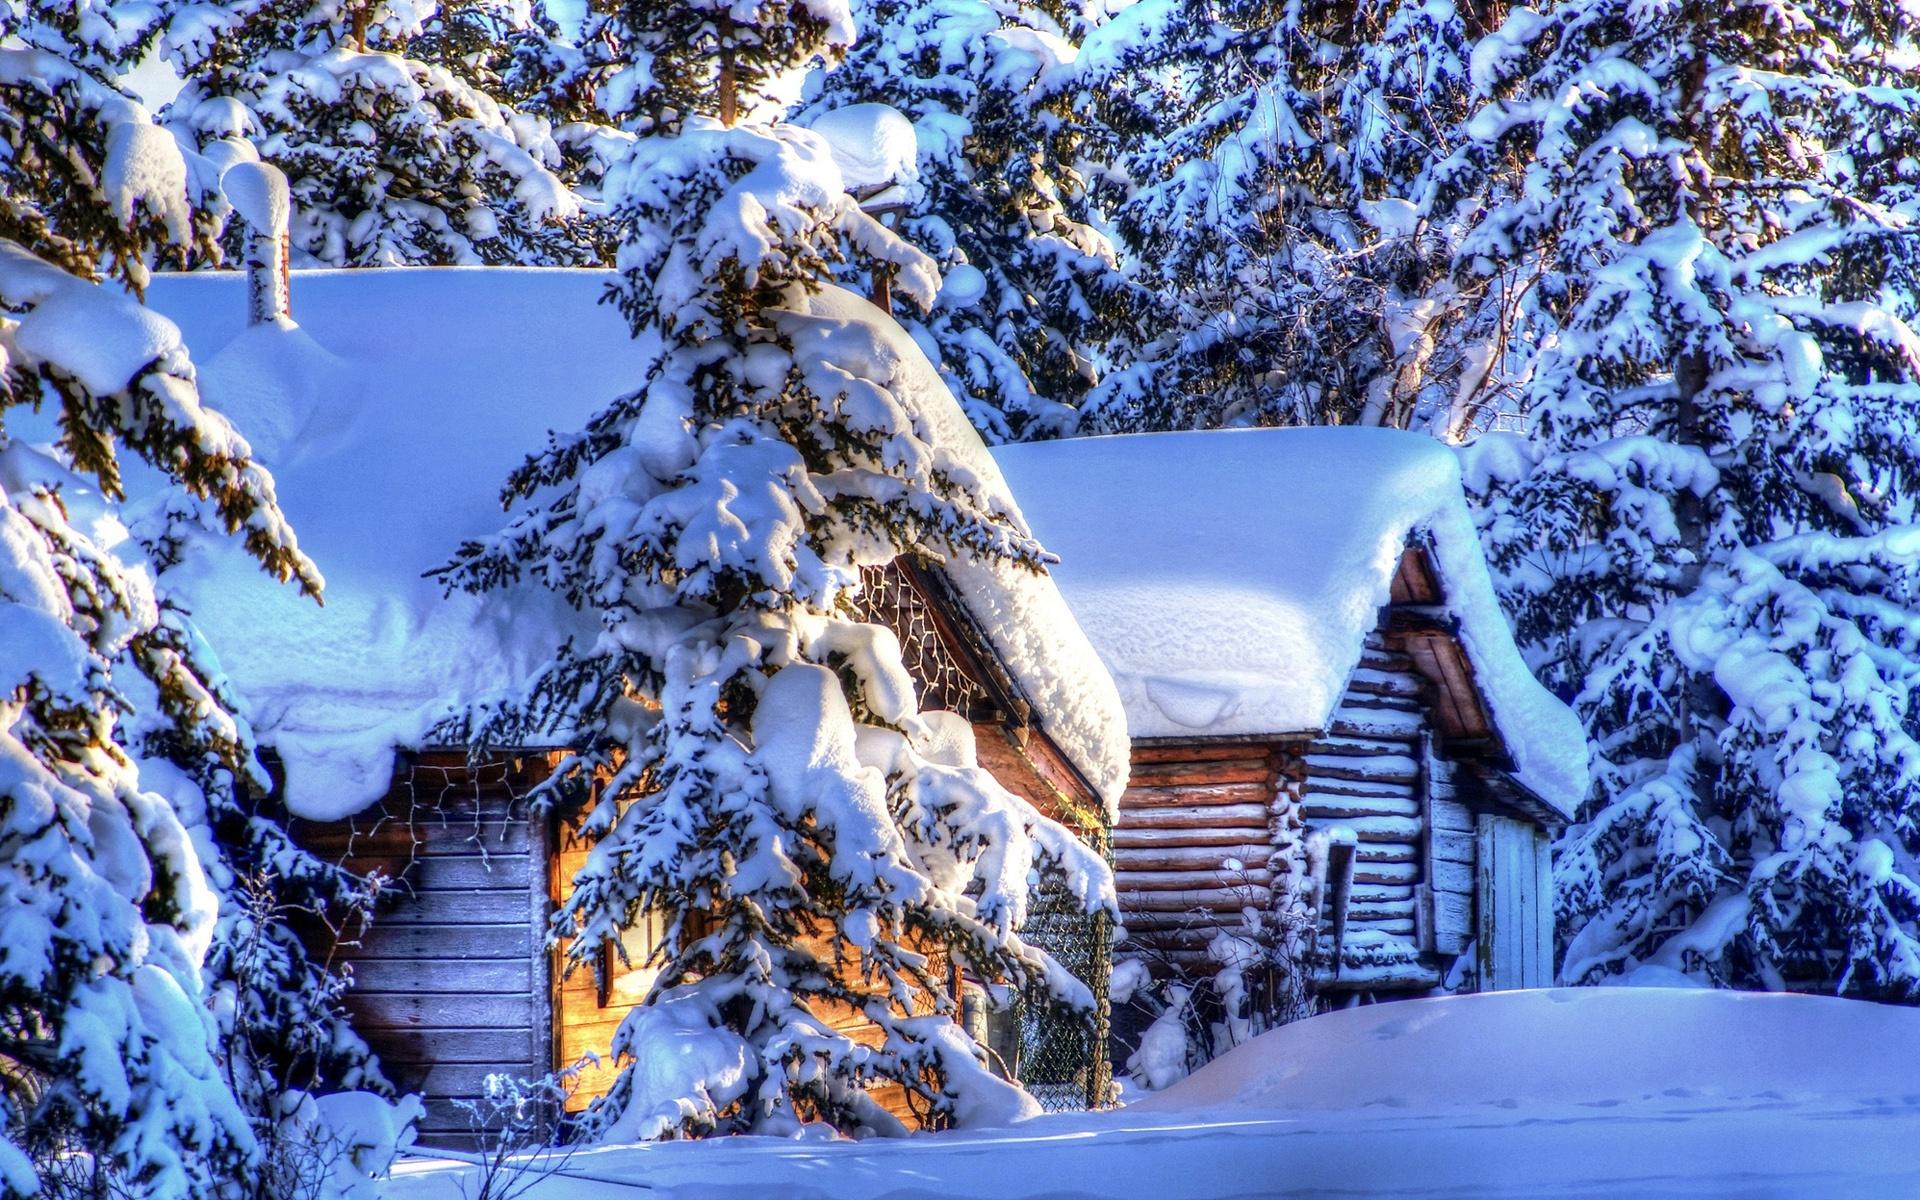 Wallpaper Alaska Winter Landscape Snow Forest Spruce